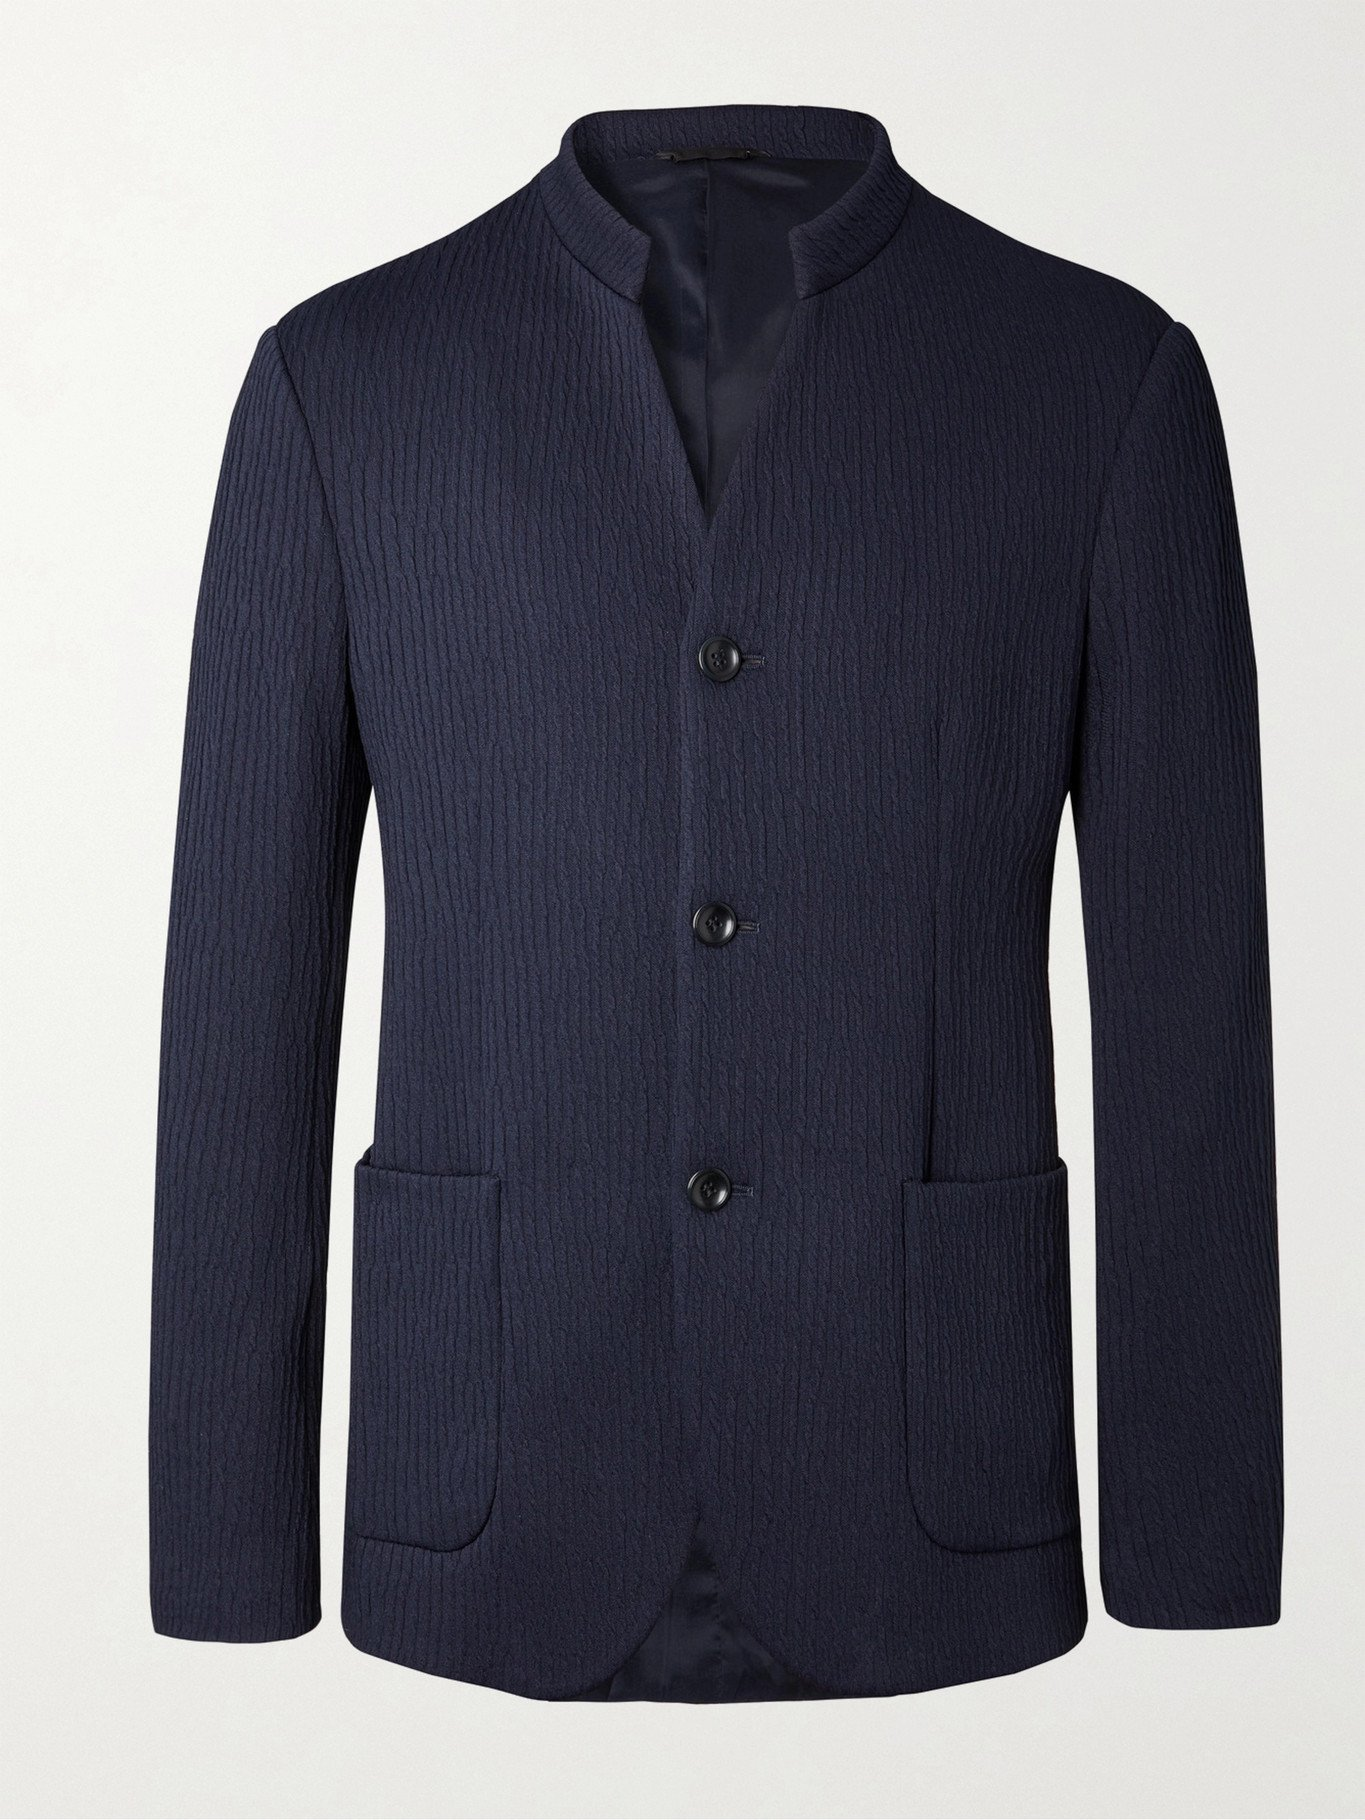 GIORGIO ARMANI - Slim-Fit Mandarin-Collar Unstructured Textured Stretch-Jersey Blazer - Blue